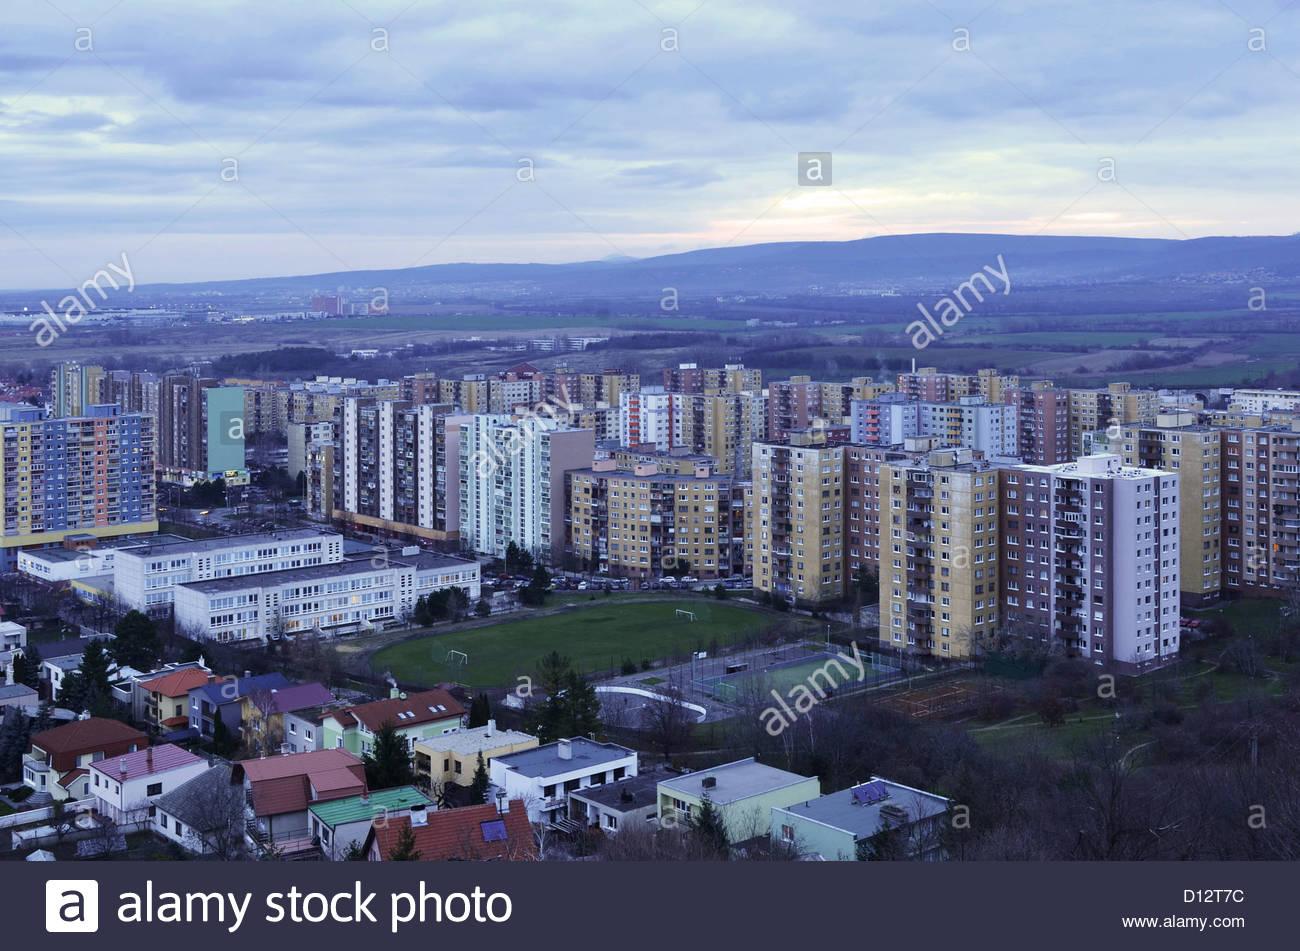 Devinska Nova Ves (Bezirk Bratislava) Slowakei sozialistische Wohnblocks trüben Wintertag. Stockbild